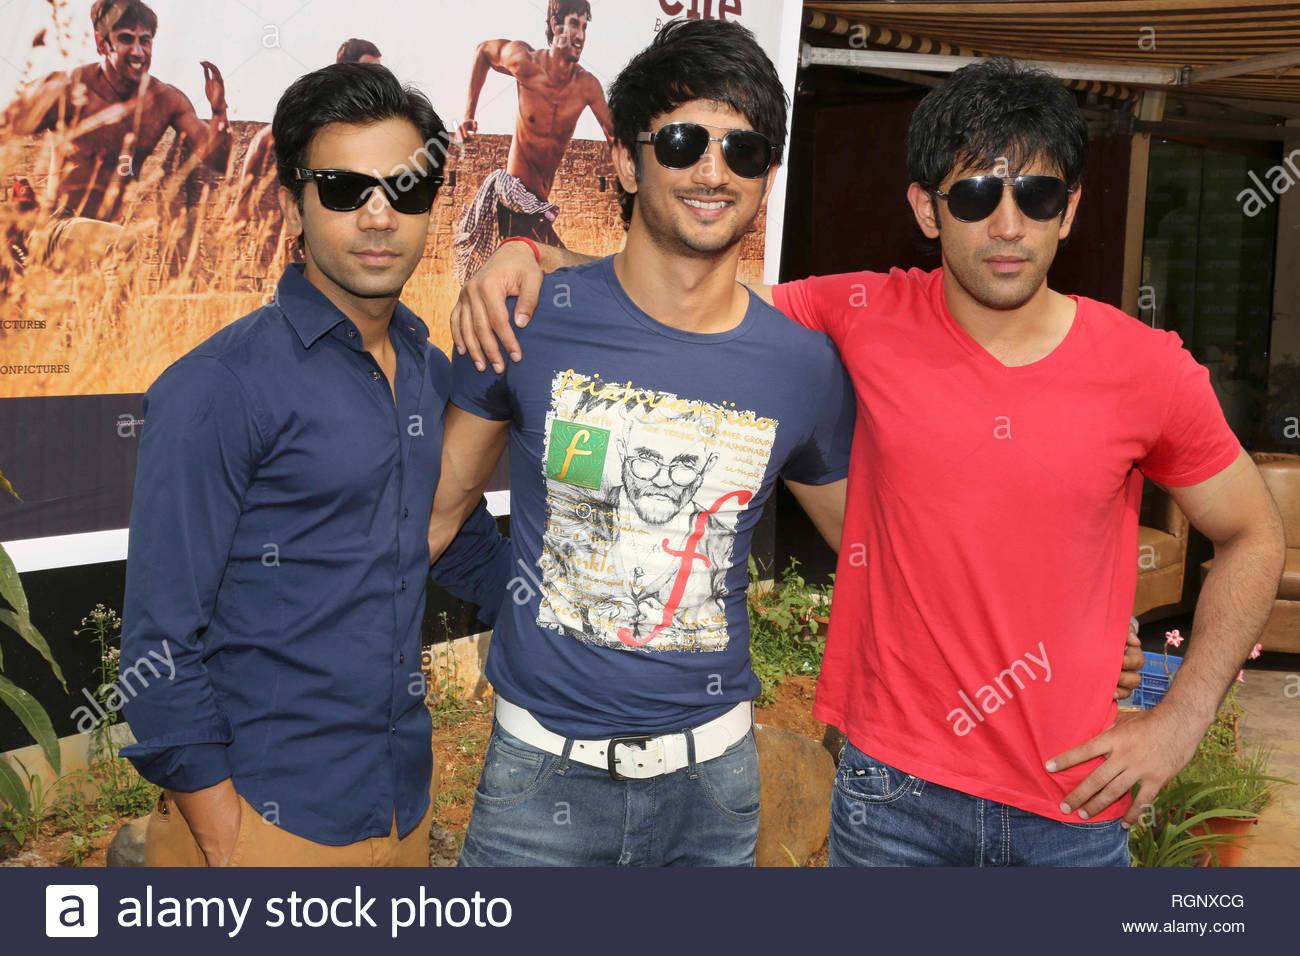 Raj Kumar Yadav Stock Photos & Raj Kumar Yadav Stock Images - Alamy